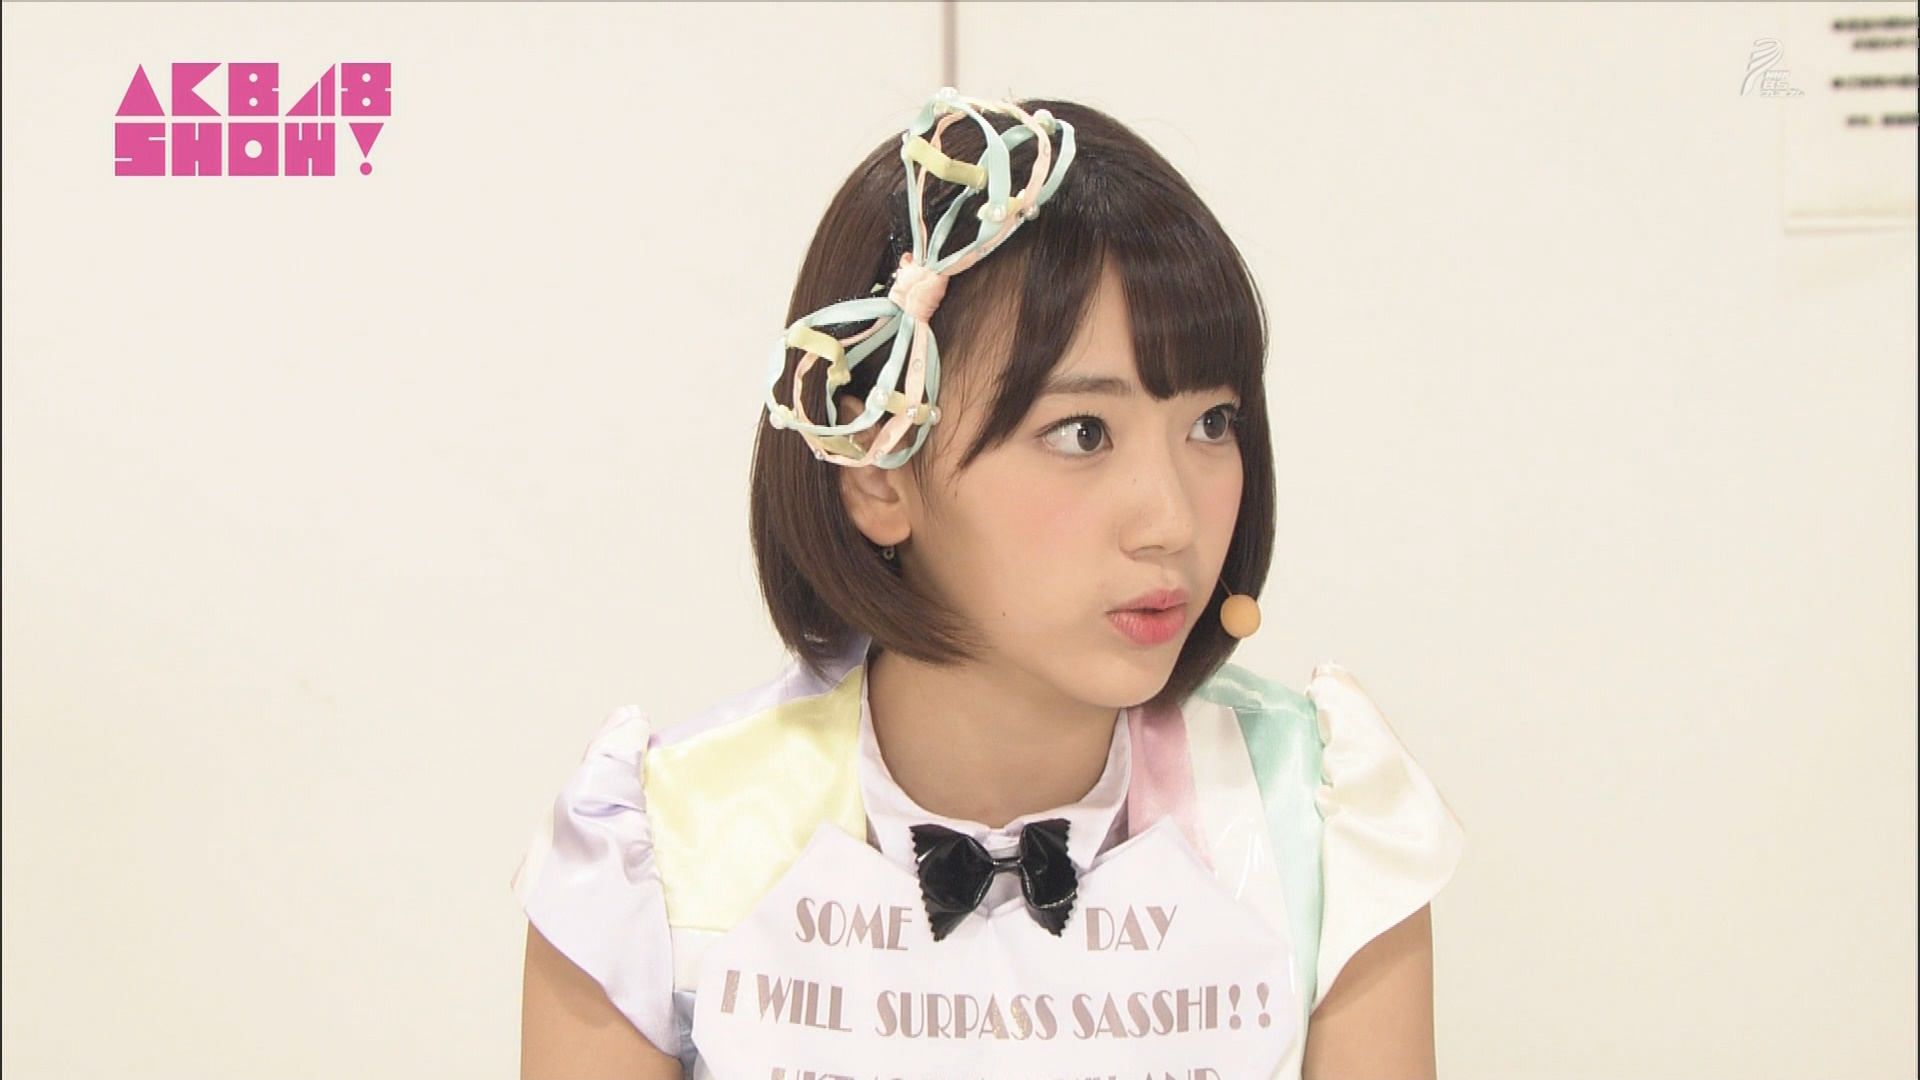 AKB48SHOW 心のプラカード 宮脇咲良 20140830 (11)